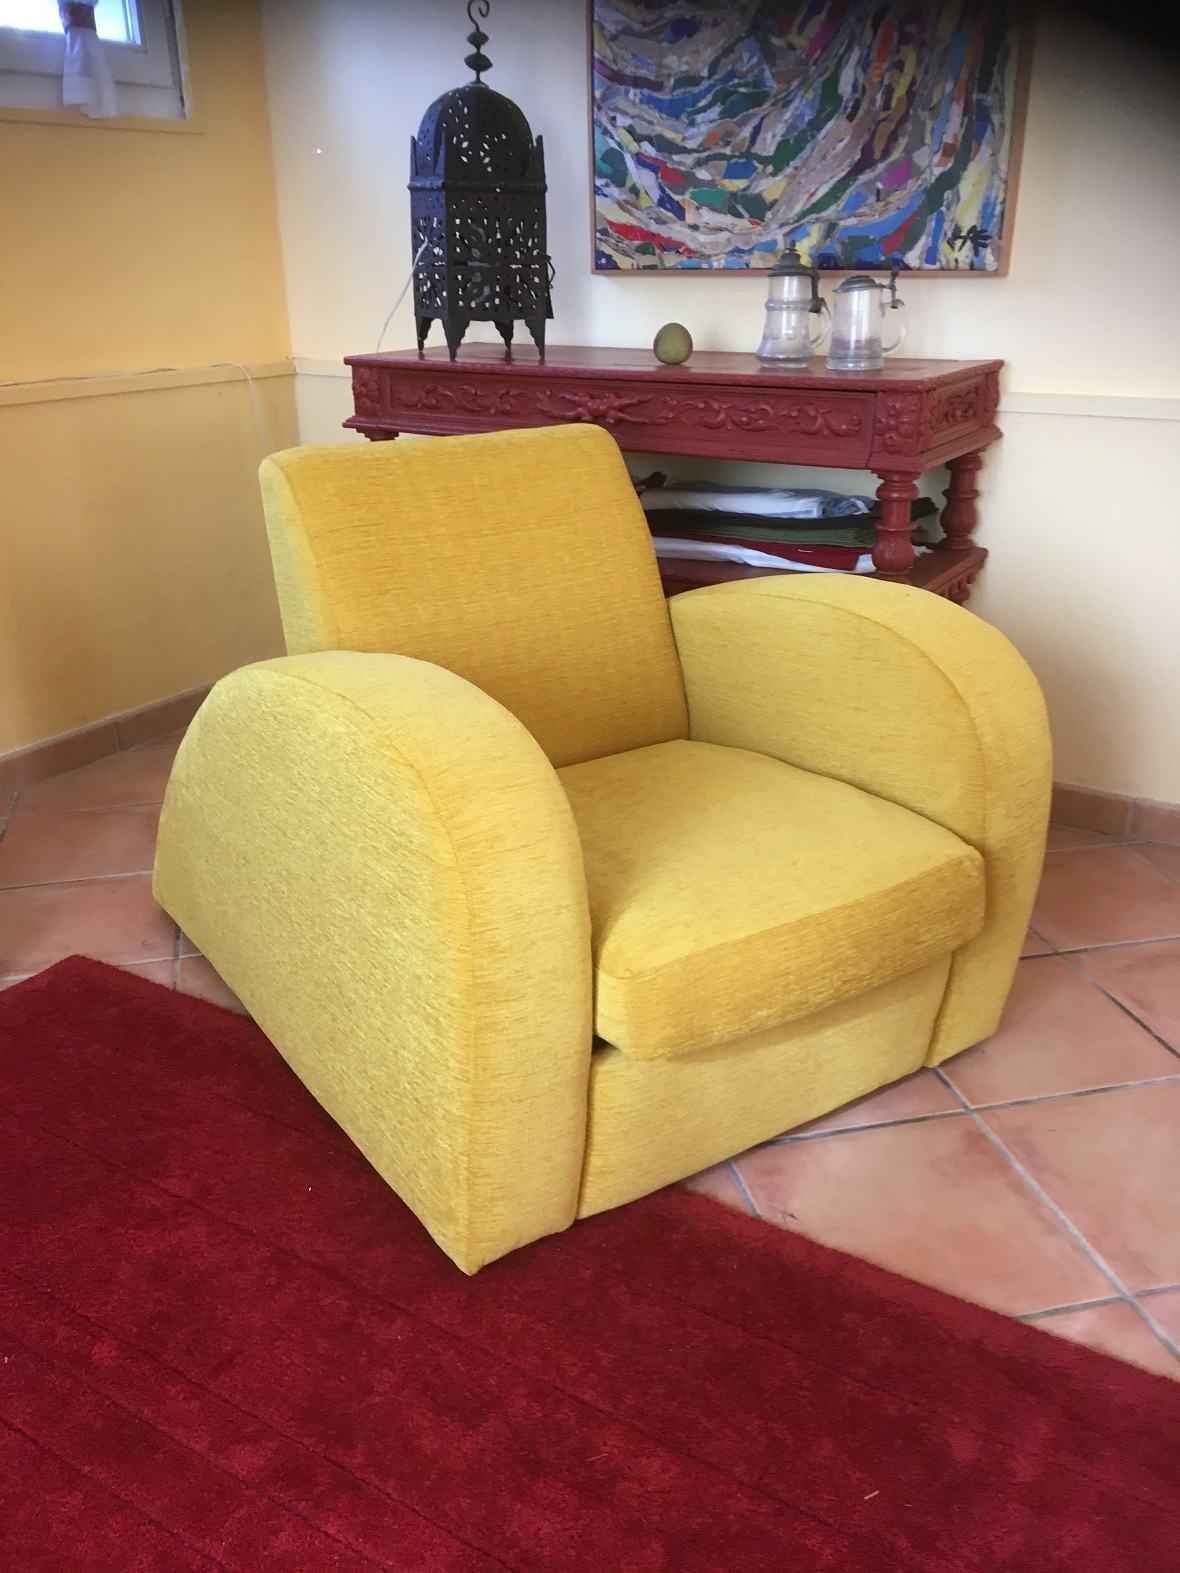 fauteuil ann e 70 gilles auriol tapissier. Black Bedroom Furniture Sets. Home Design Ideas